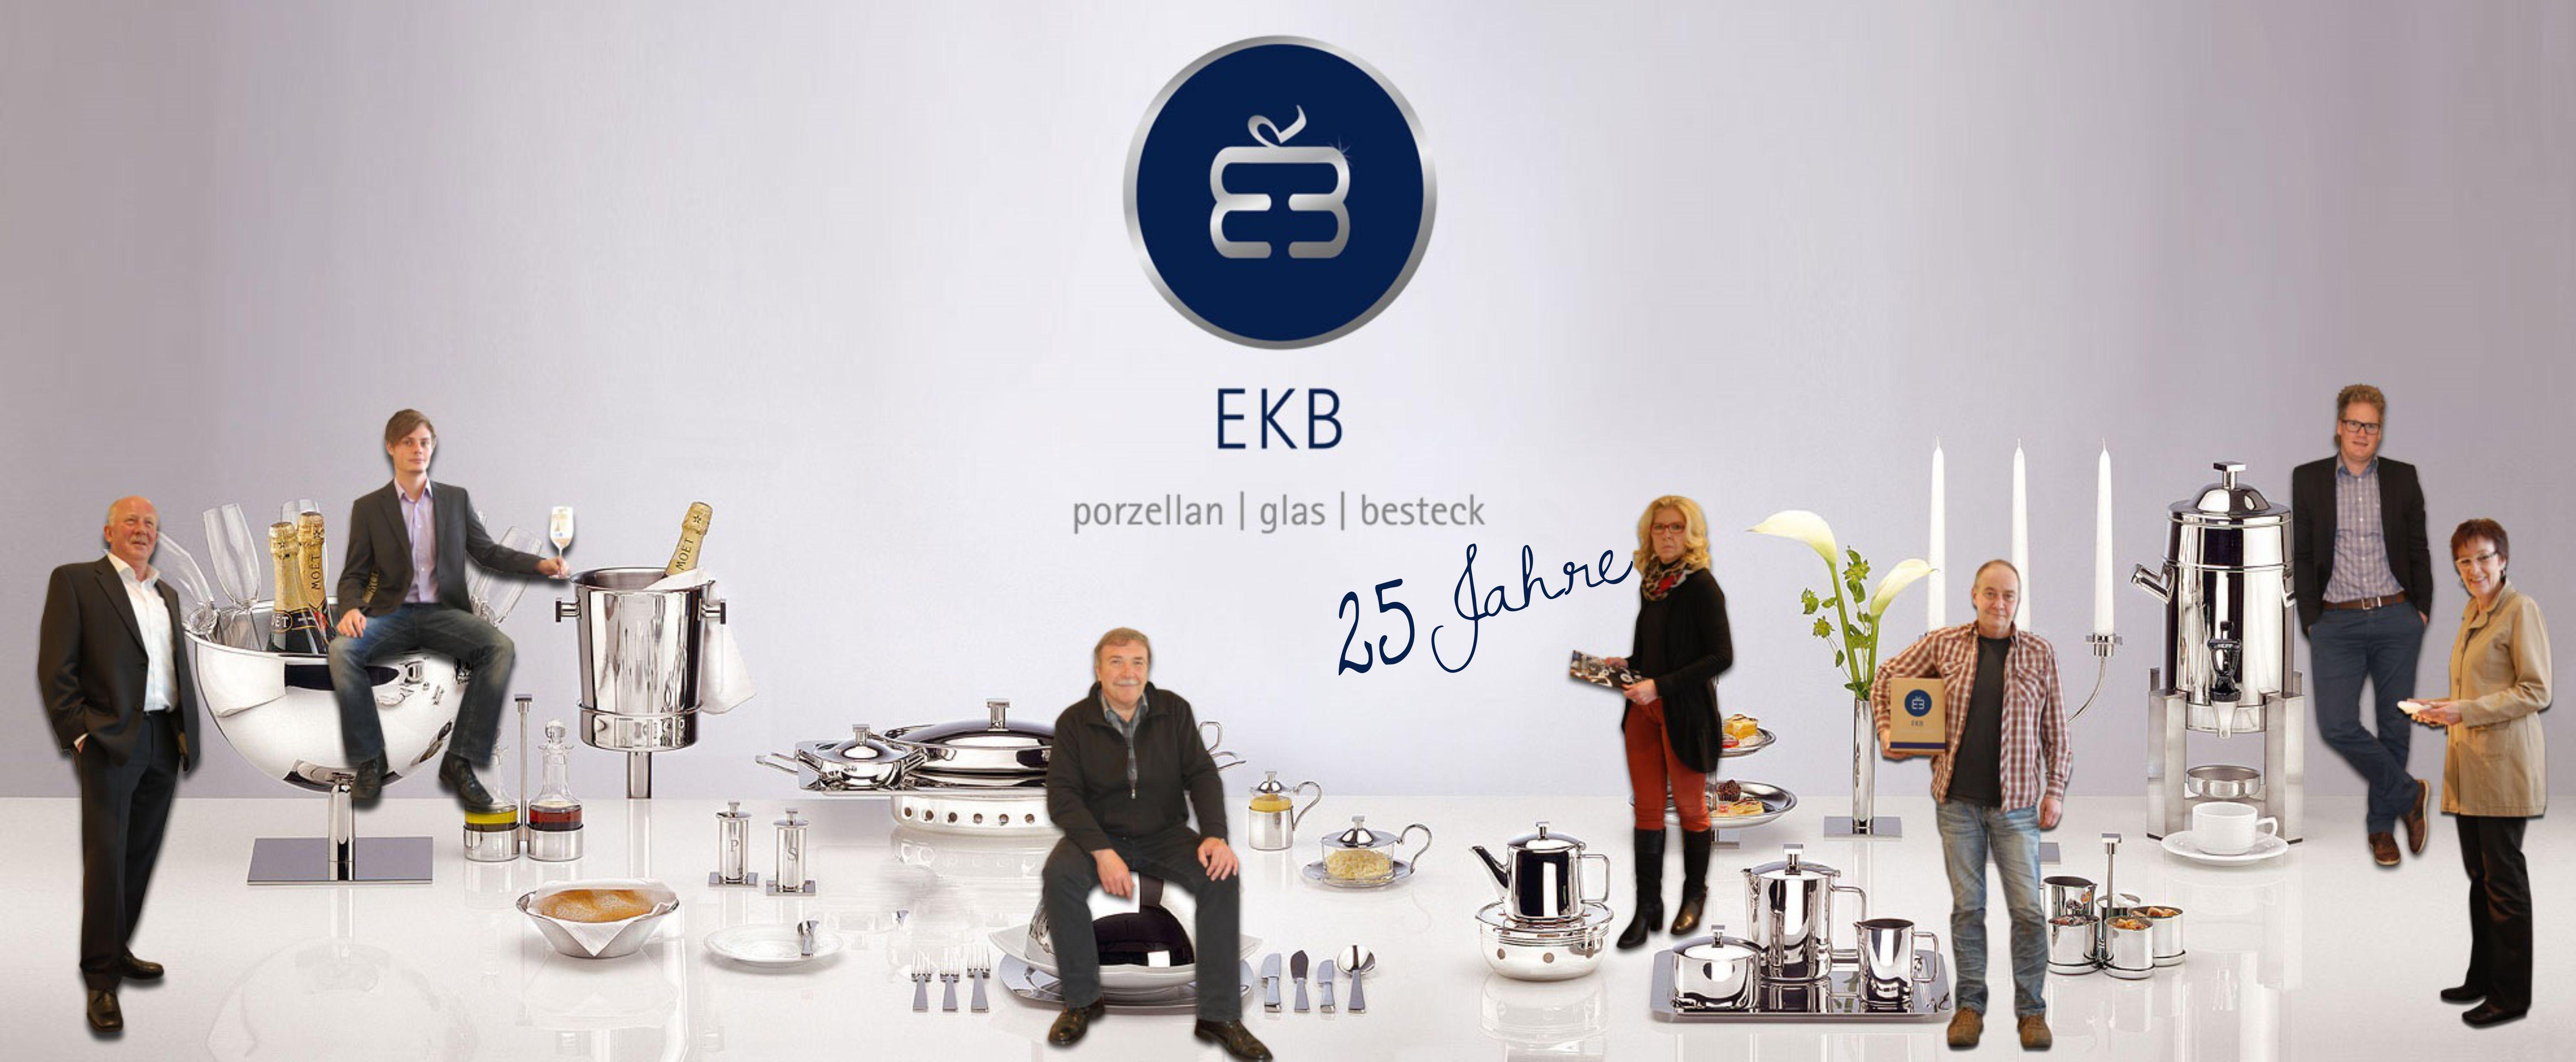 EKB Teamfoto